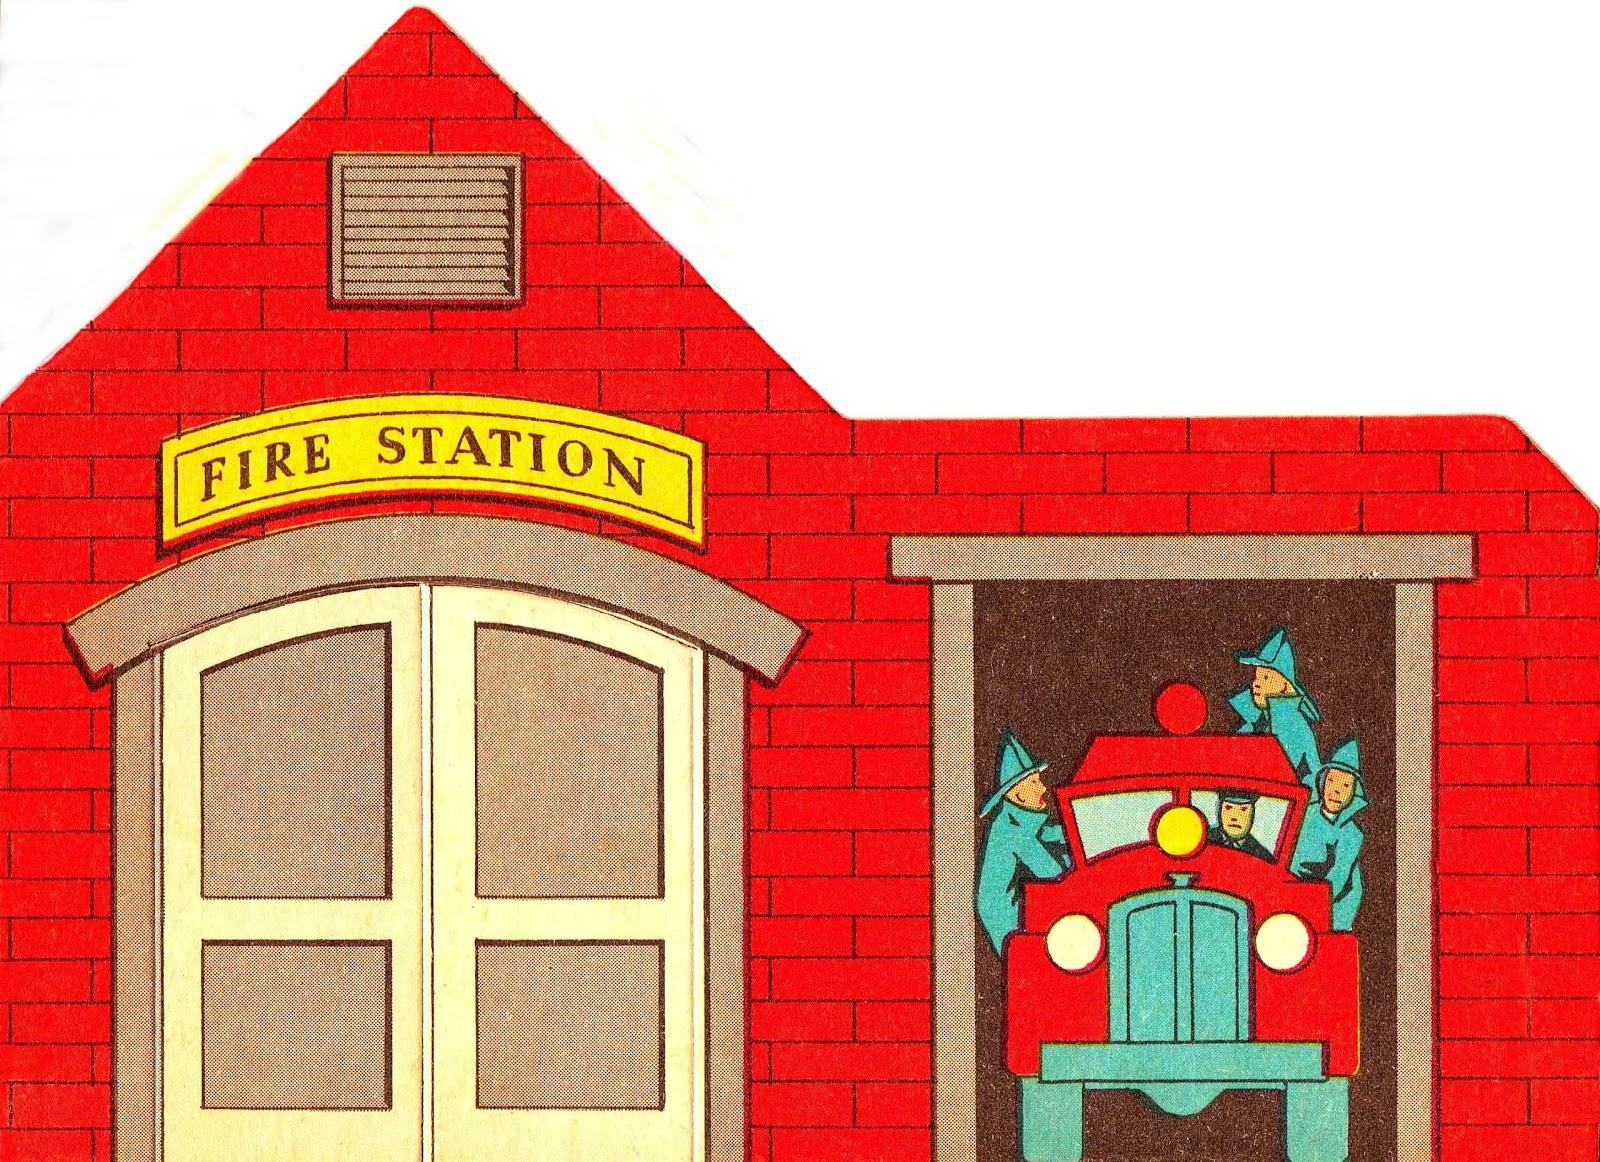 cartoon fire station clipart best firehouse clipart black and white firehouse clipart black and white